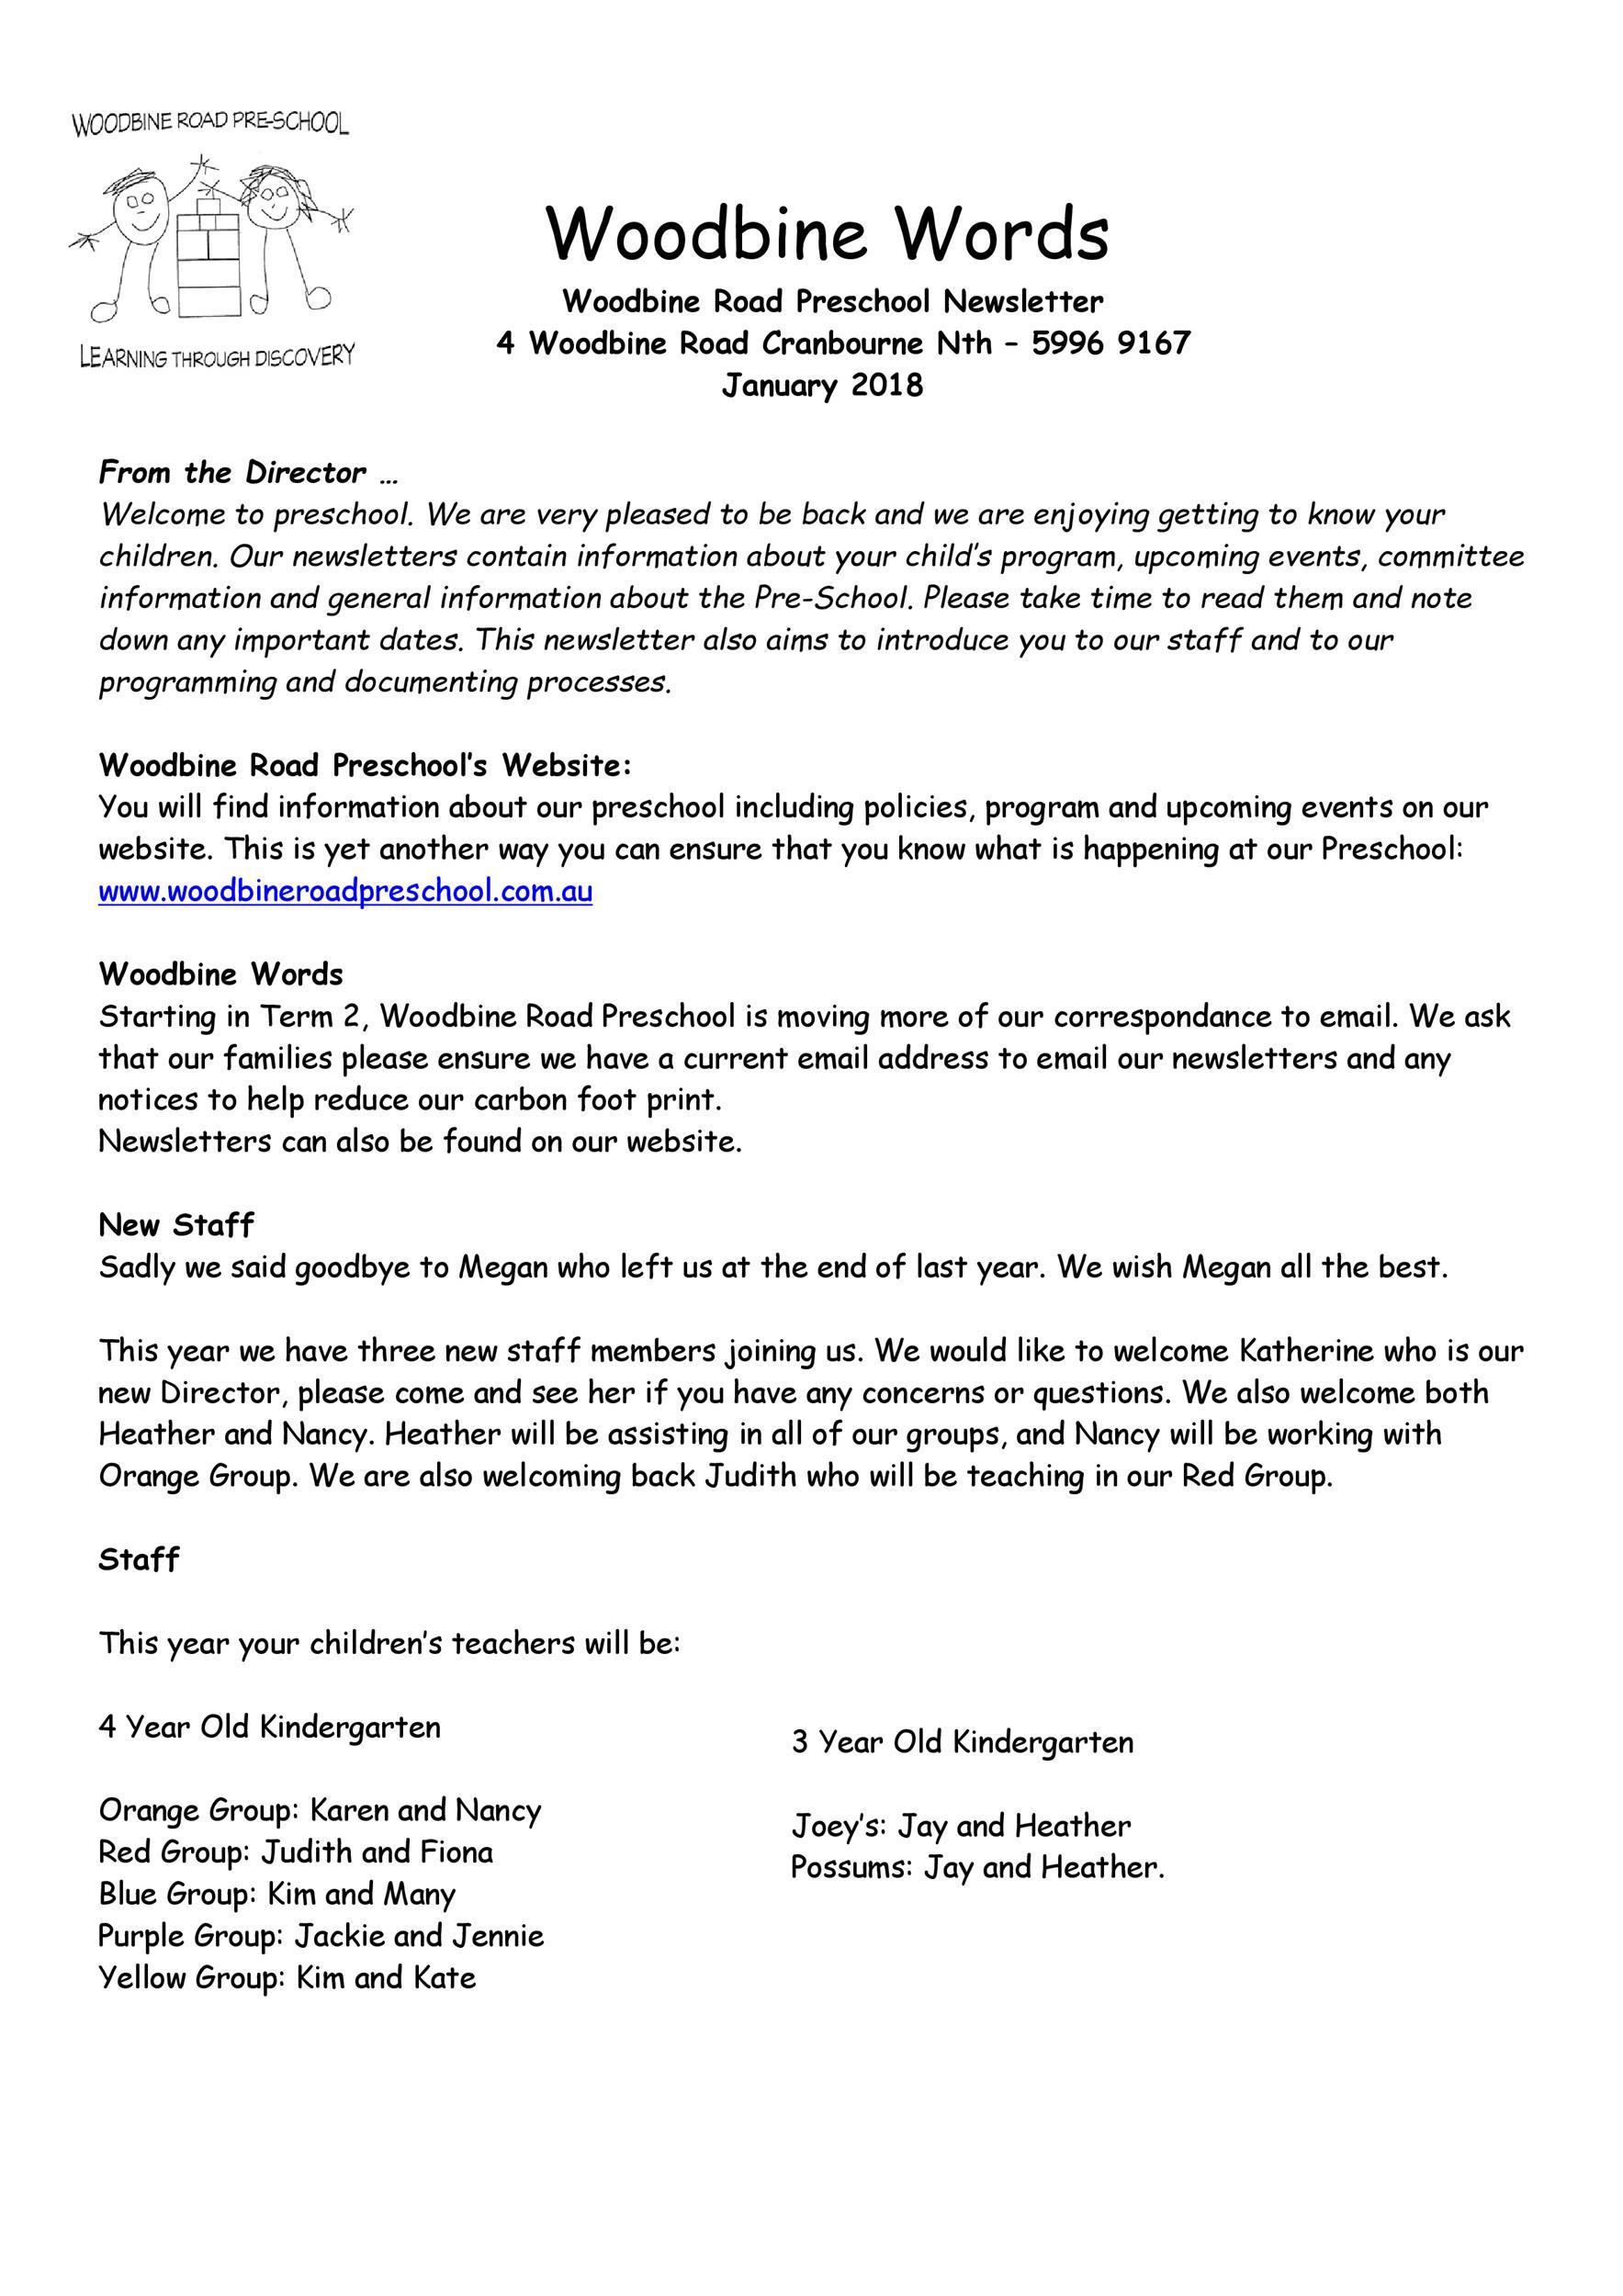 Free preschool newsletter template 44